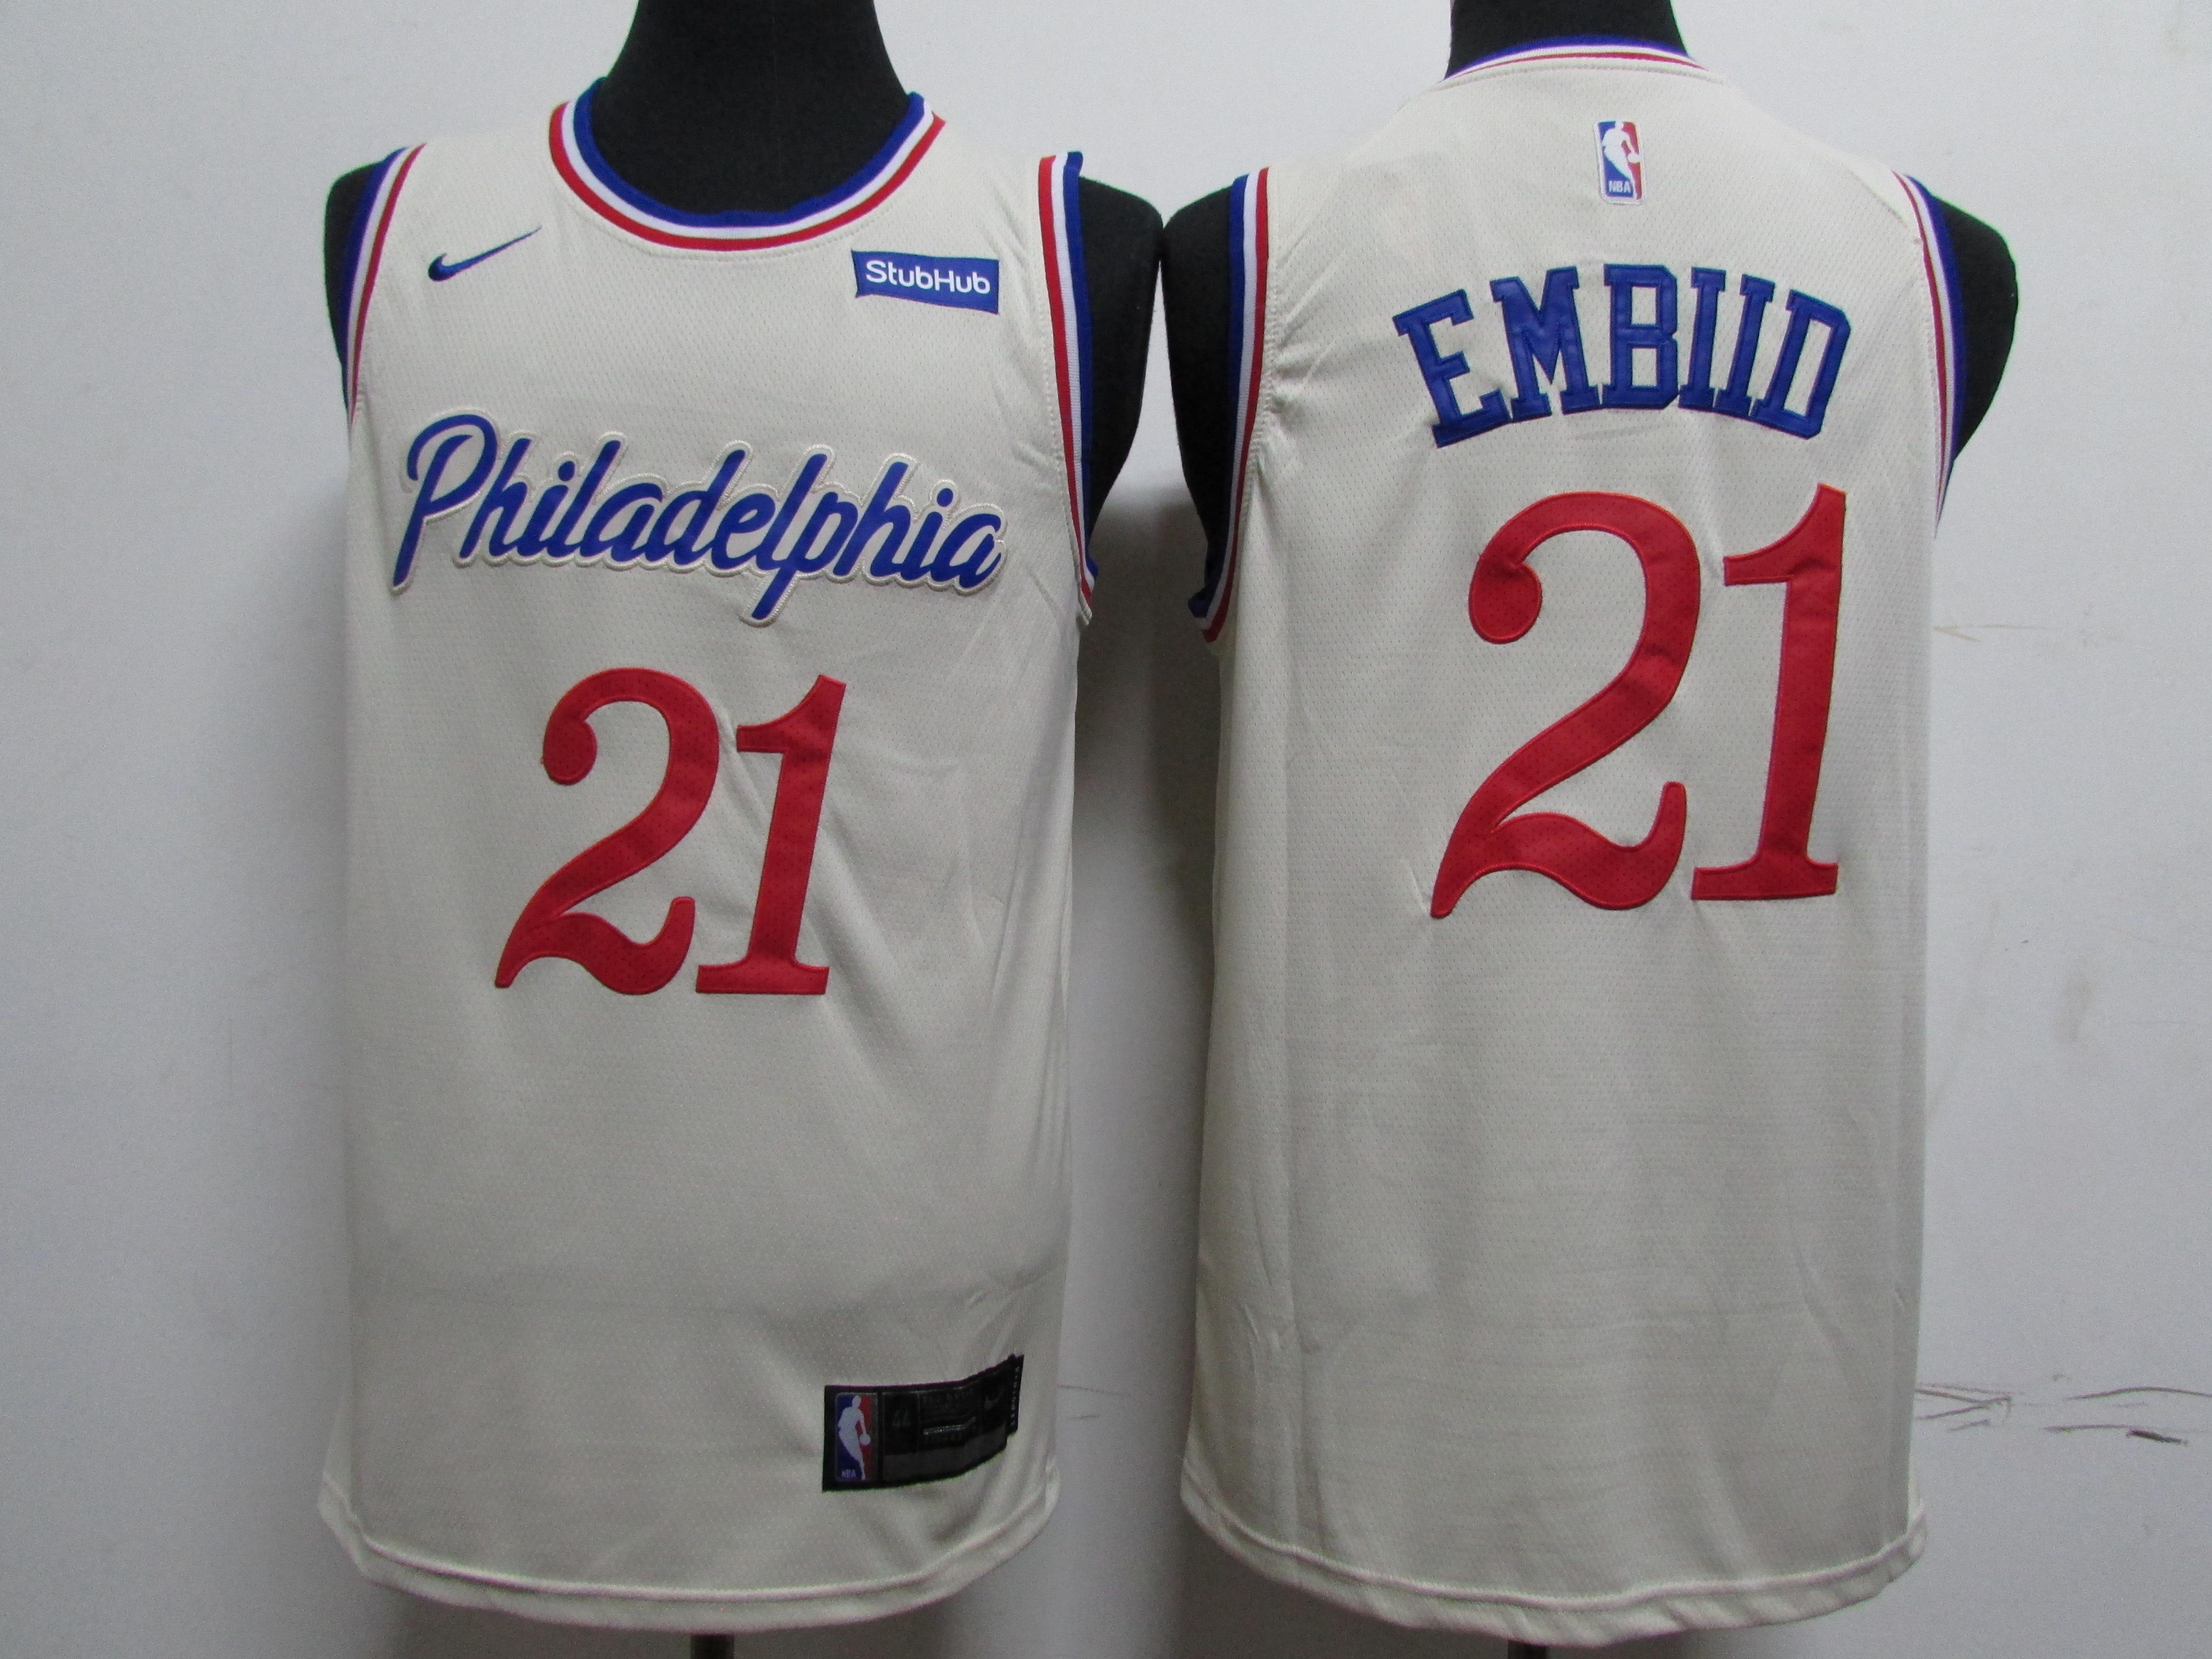 76ers 21 Joel Embiid Cream 2019-20 City Edition Nike Swingman Jersey